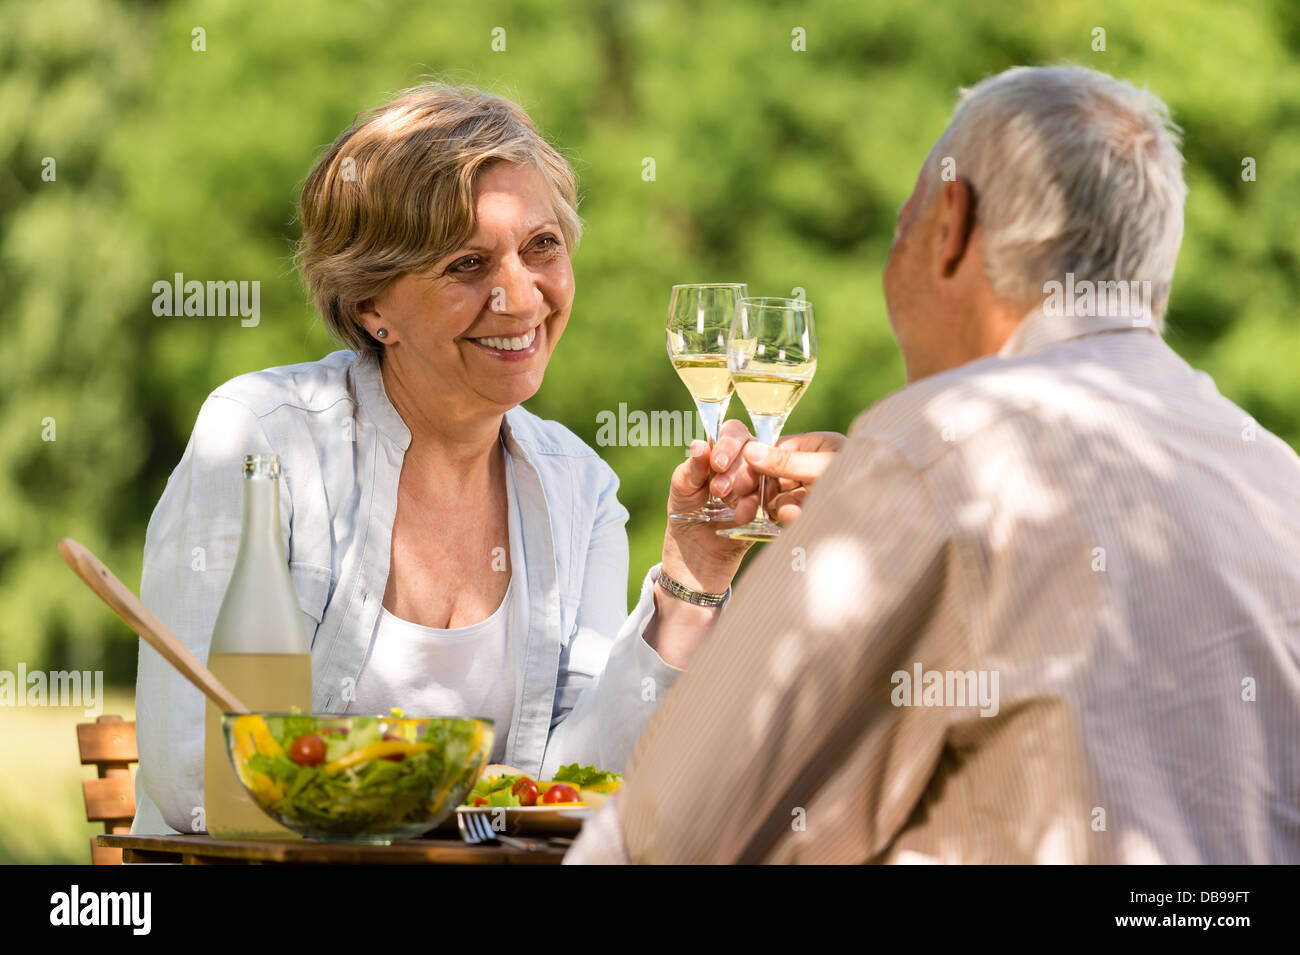 Felice dei cittadini anziani bicchieri tintinnanti nel giardino Immagini Stock